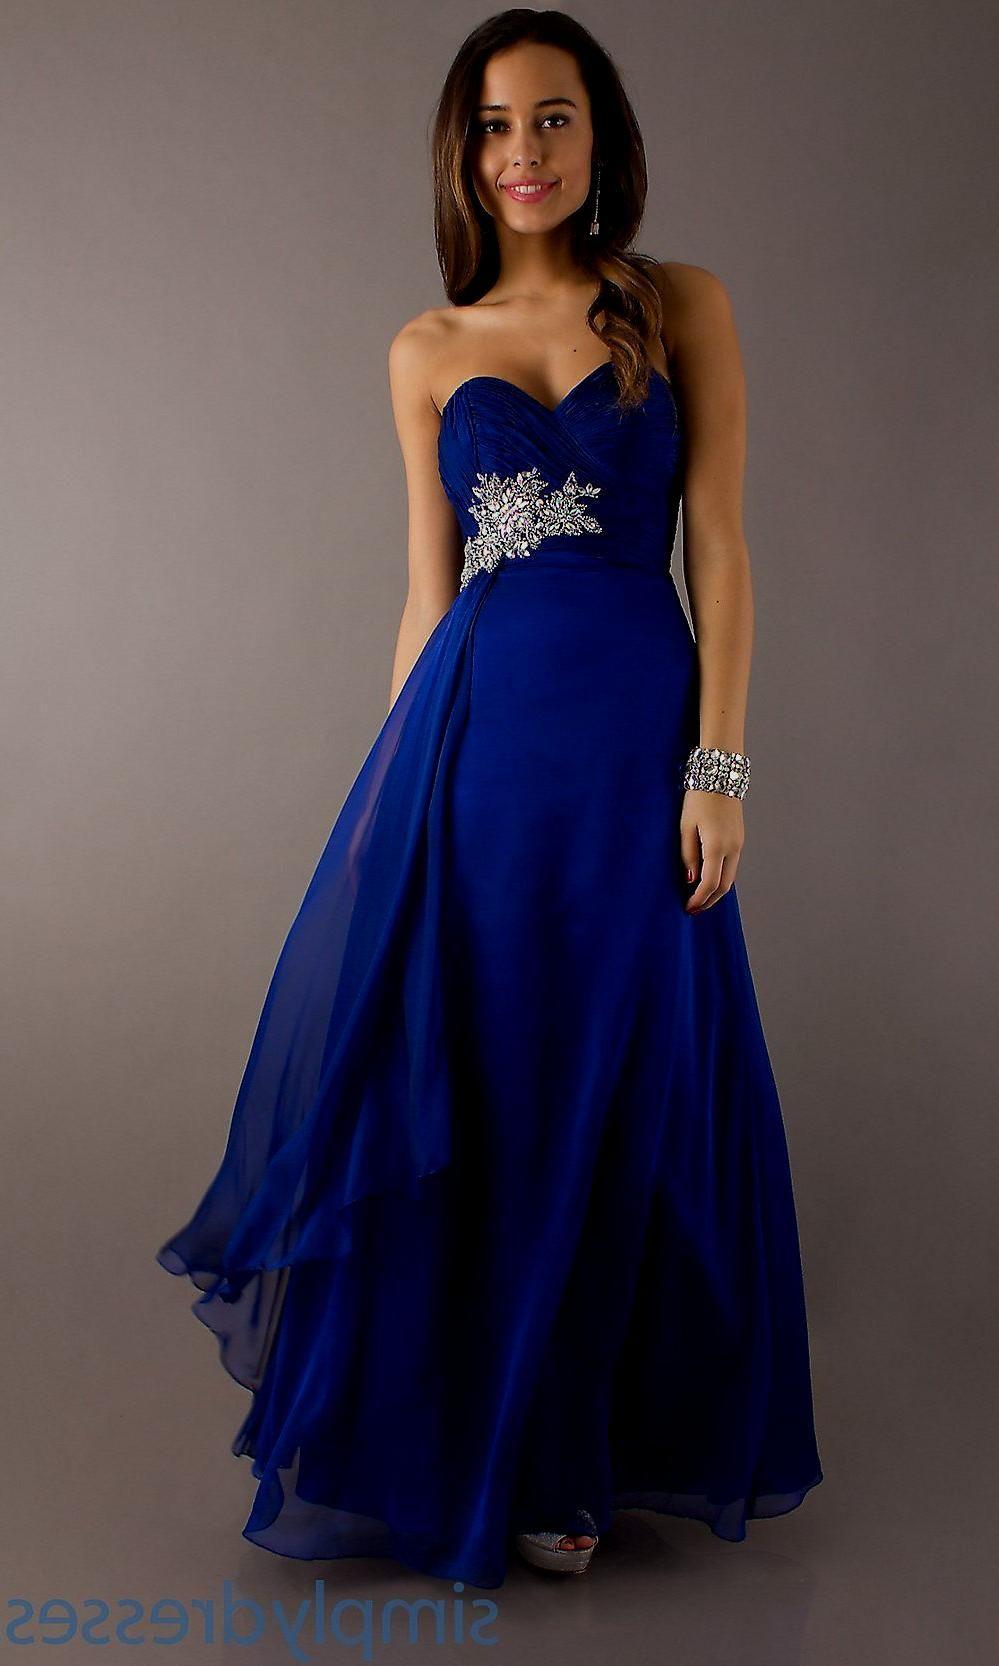 Bridesmaid Dresses Royal Blue And Silver 1 Bridesmaid Dresses Royal Blue Bridesmaid Dresses Wedding Bridesmaids Dresses Blue Turquoise Bridesmaid Dresses